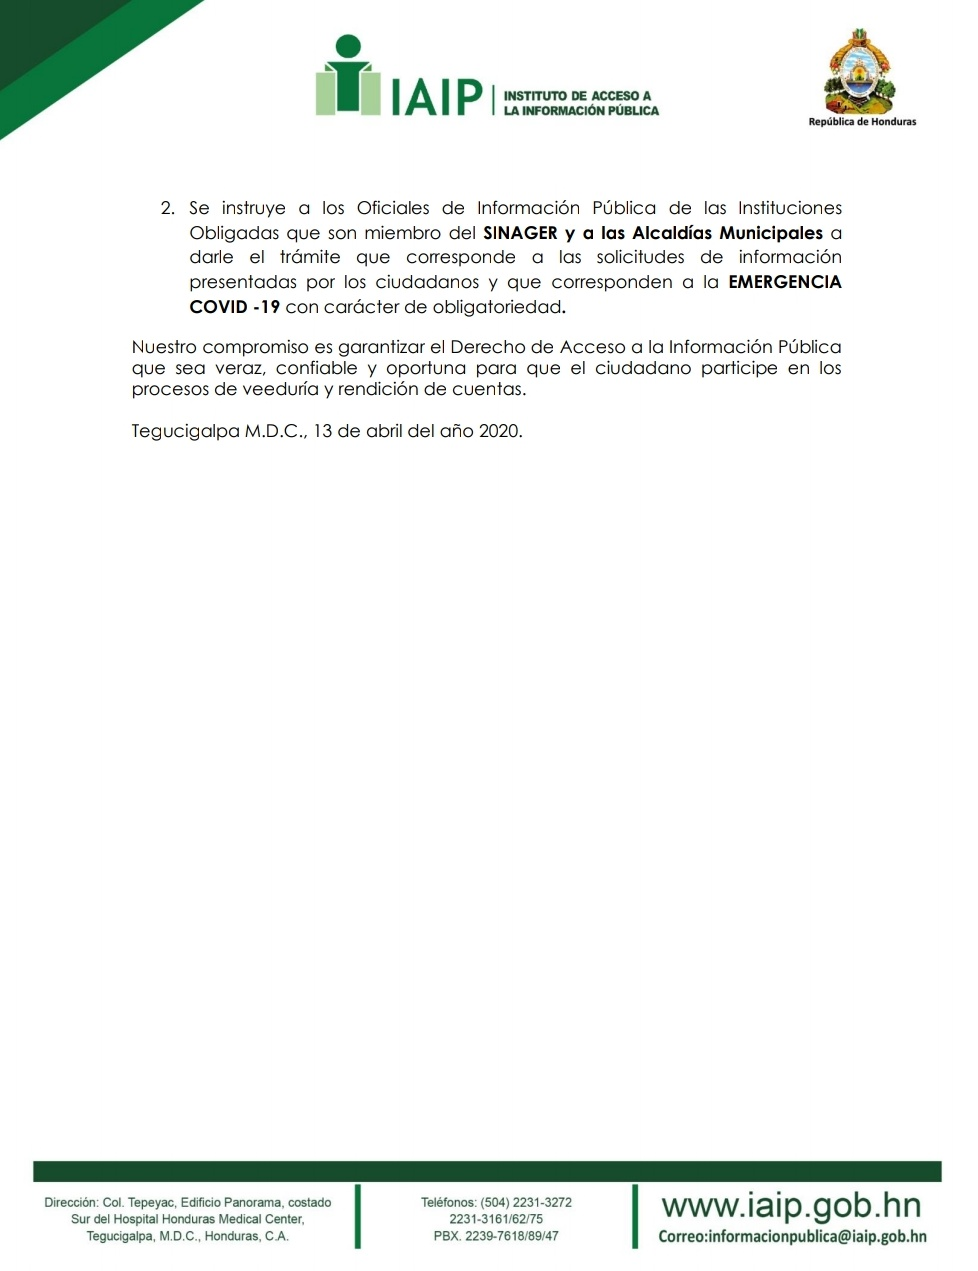 Piden dar trámite a solicitudes de información durante emergencia por COVID-19